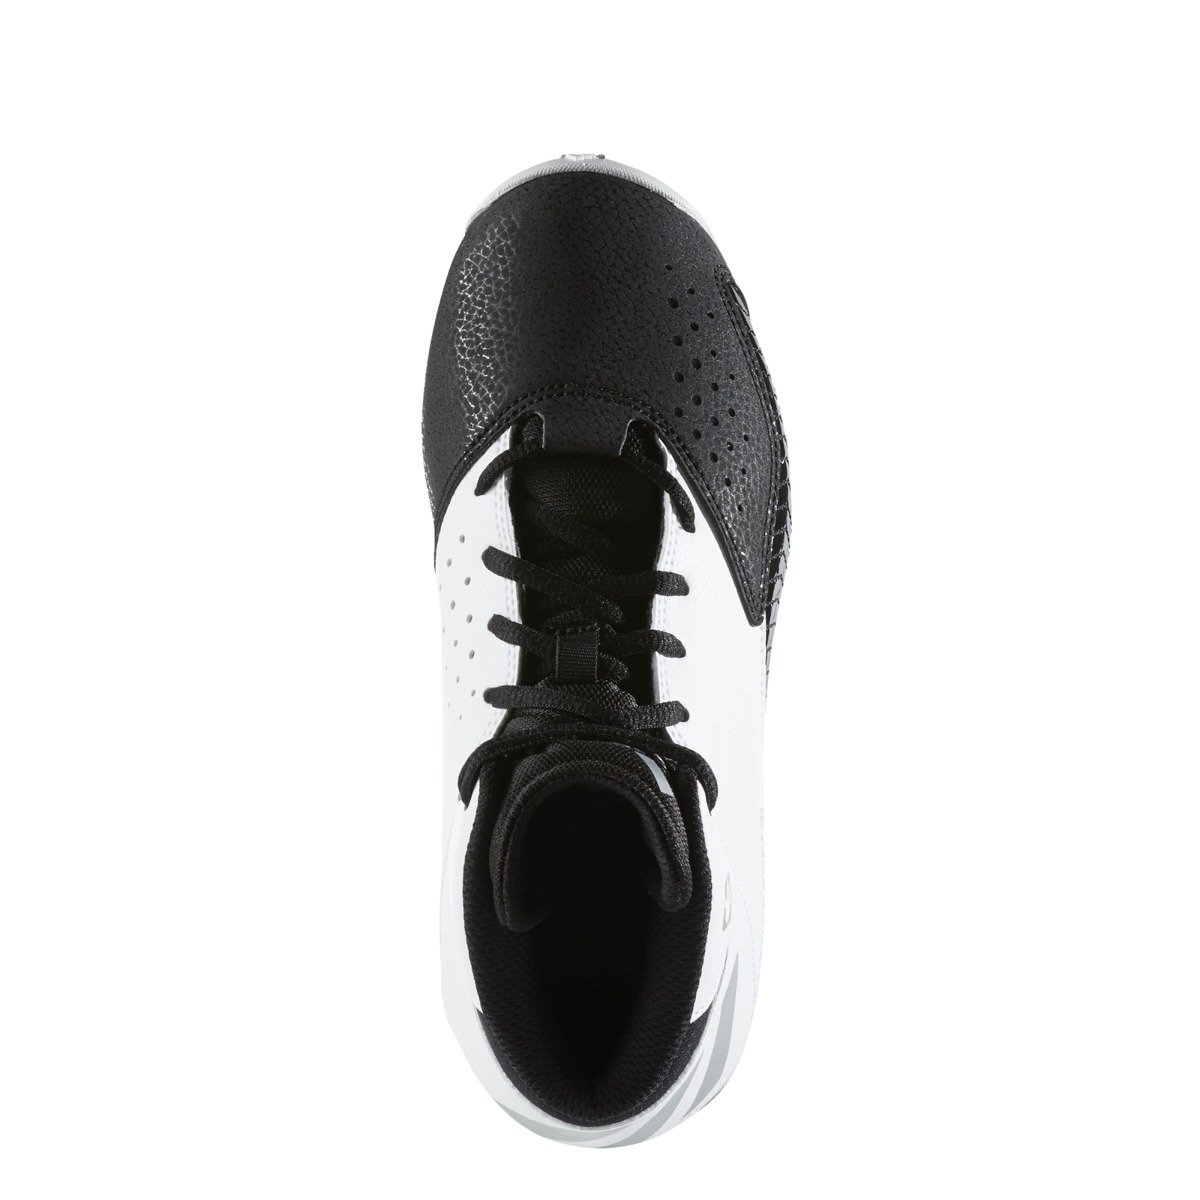 Adidas B49616 Chaussures Level Speed Next Nba 5 P8nkX0wONZ